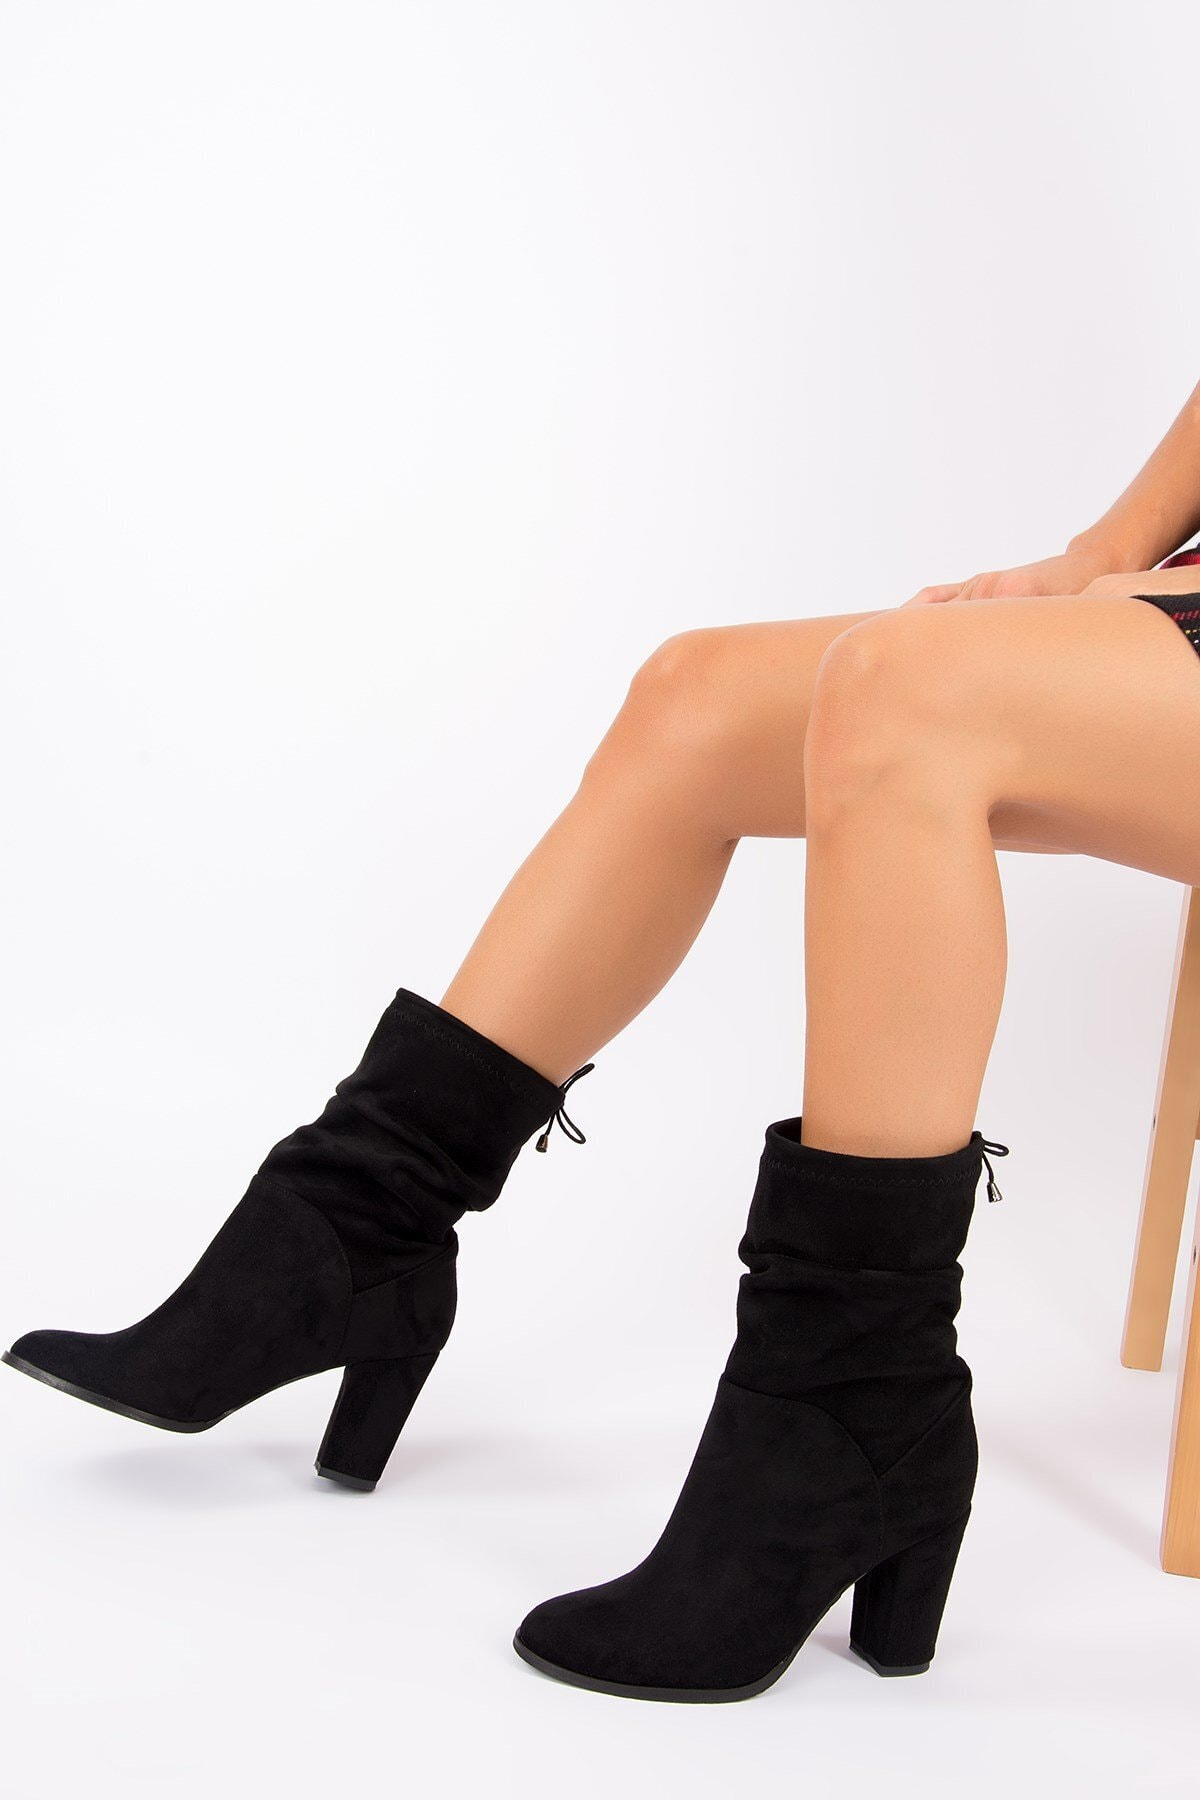 Wenti Shoes Kadın Siyah Süet Topuklu Bot Wenti Ws131 2